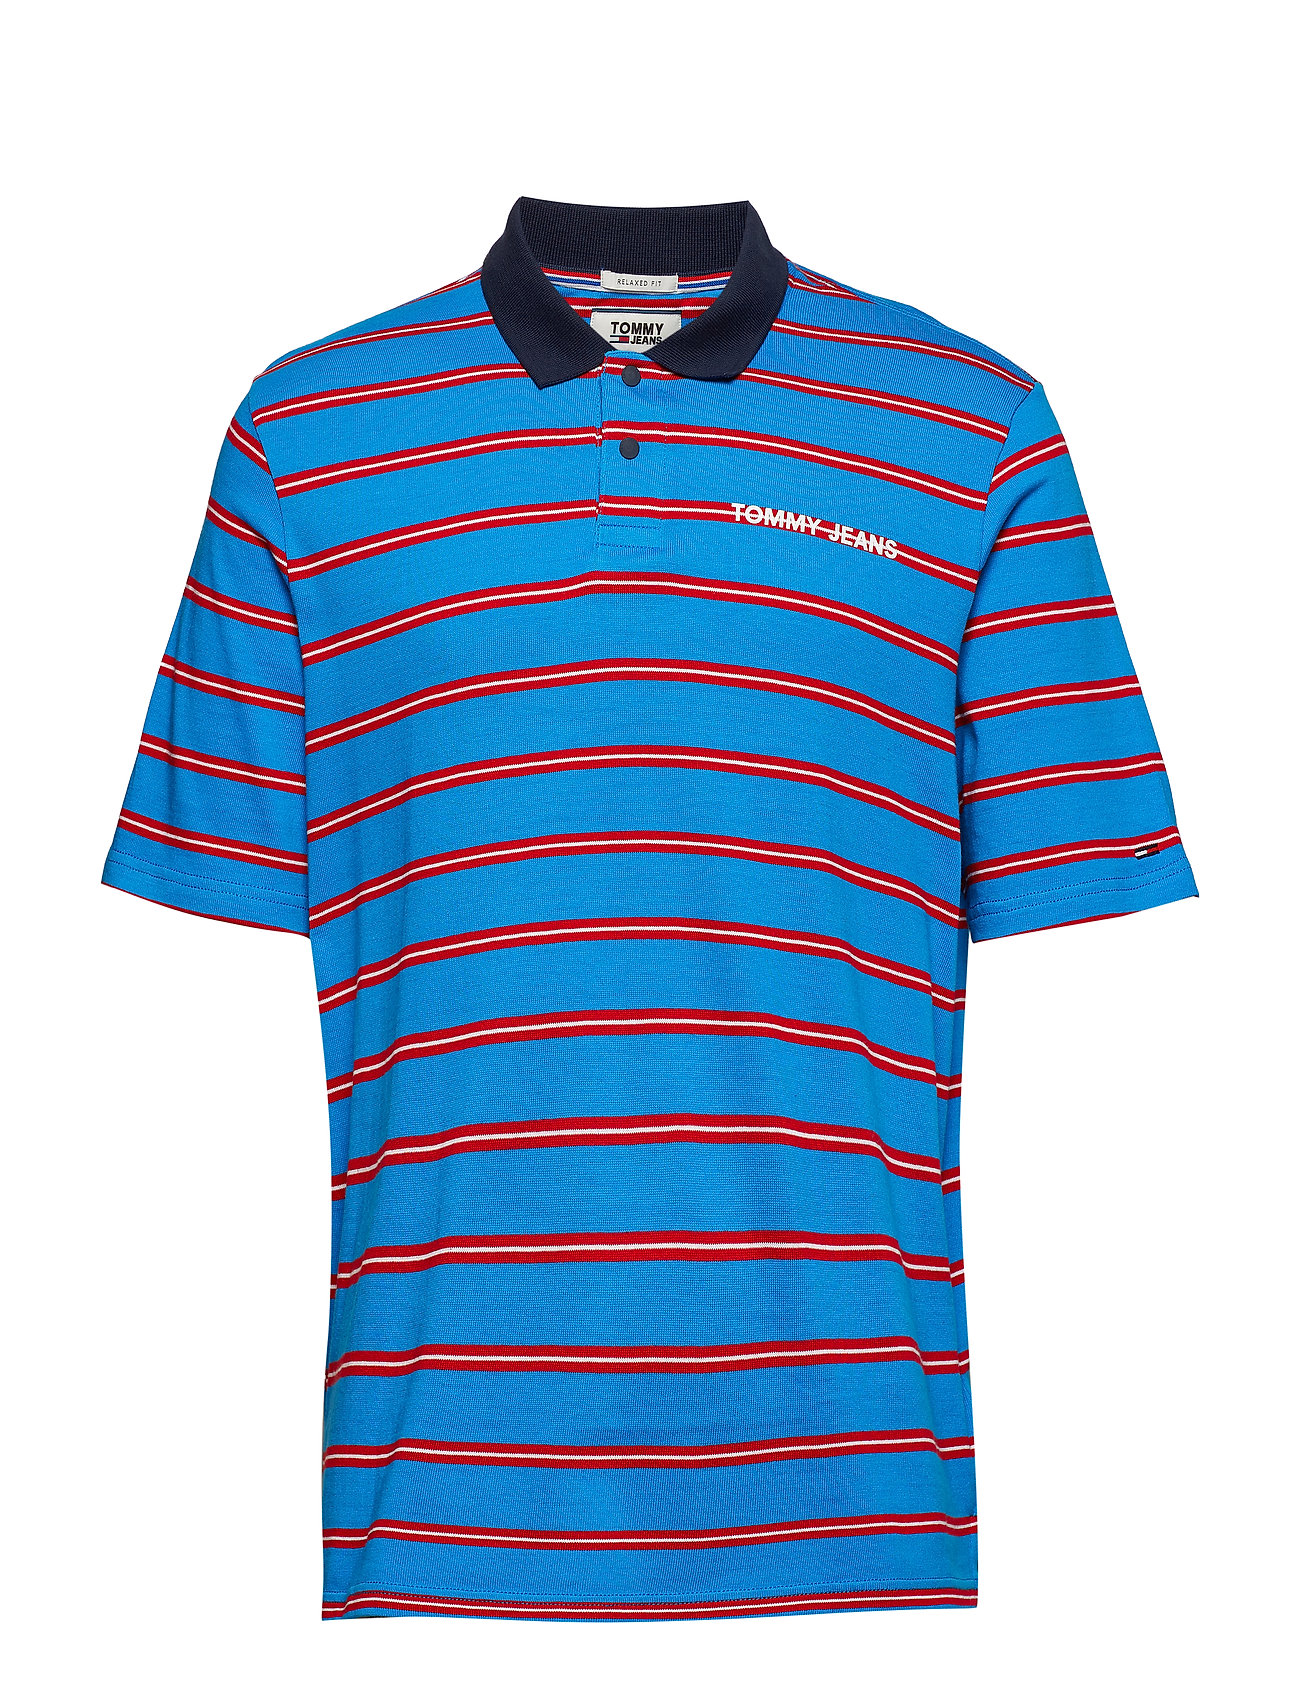 Polbrilliant Multi Stripe BlueMultiTommy Tjm Jeans mNyw8n0vO